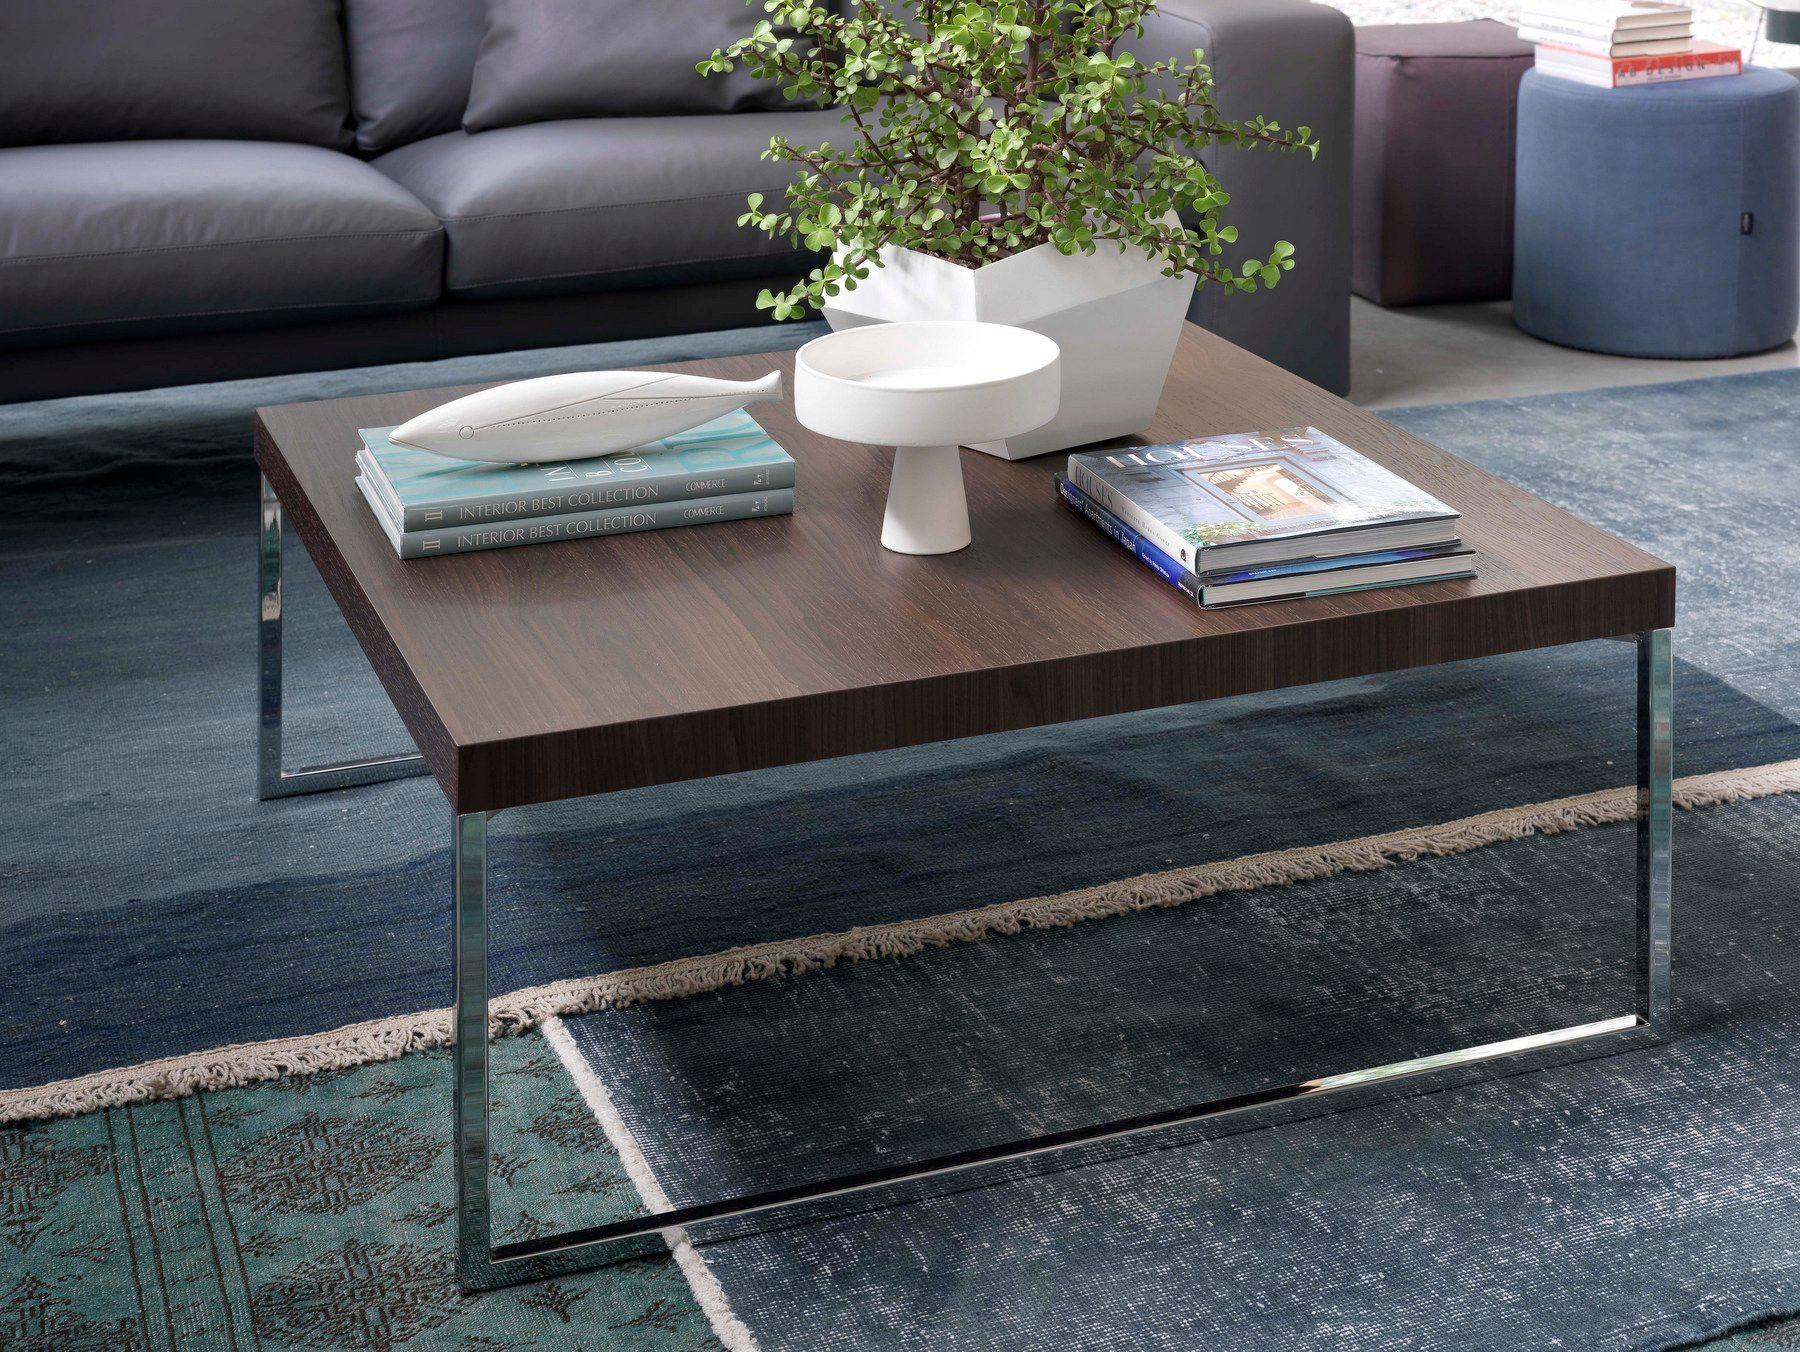 Tavolini Da Salotto Moderni Bontempi.Tavolini Da Salotto Quadrati Moderni Tavolini Bassi Da Salotto